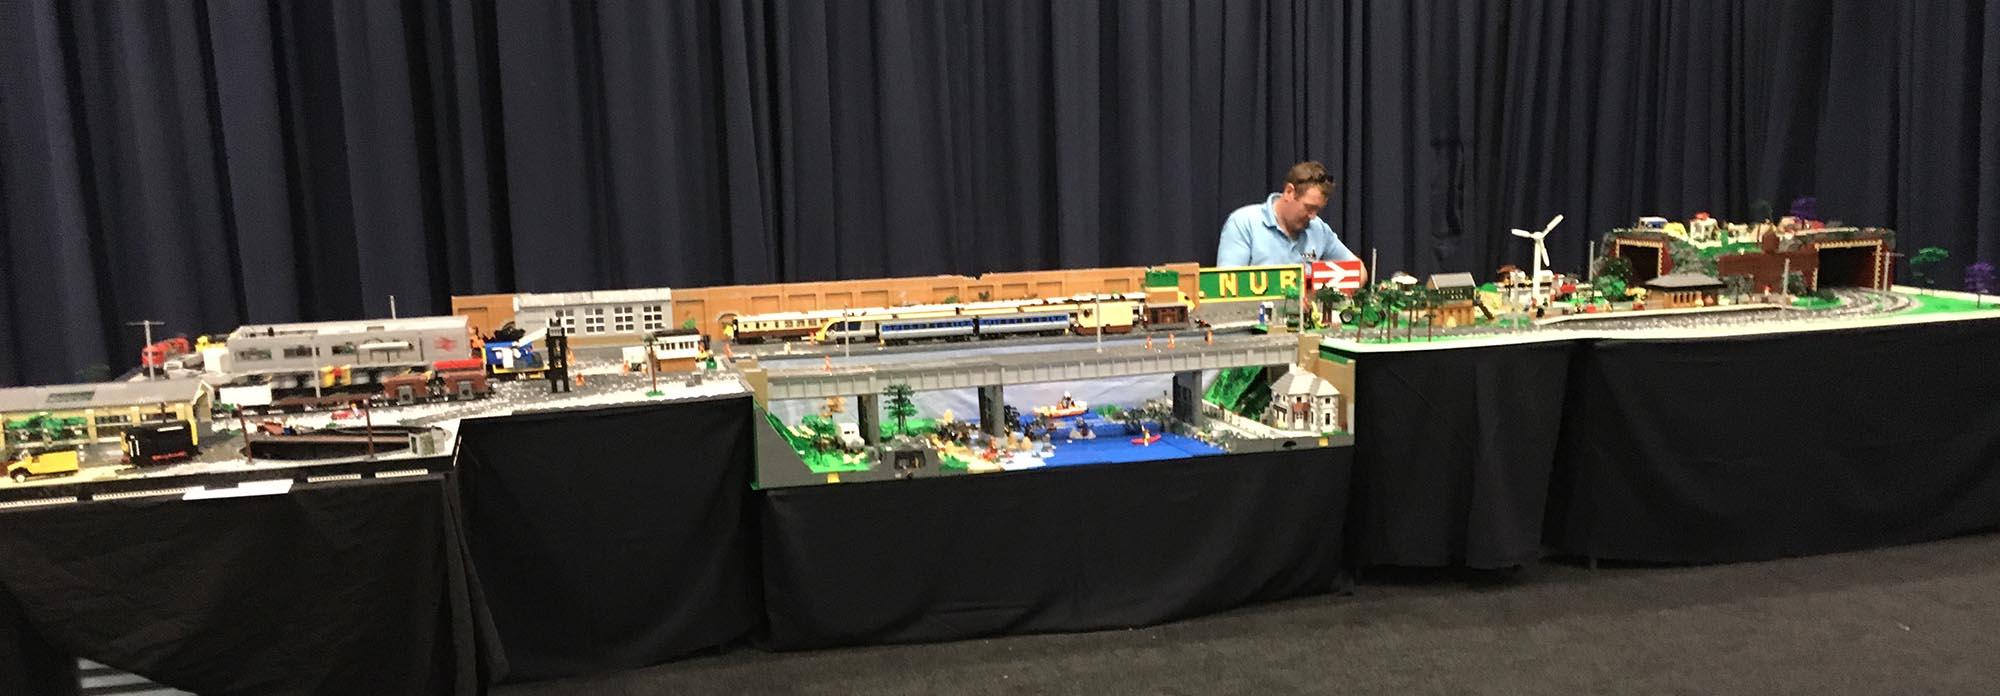 LEGO train displays in the UK